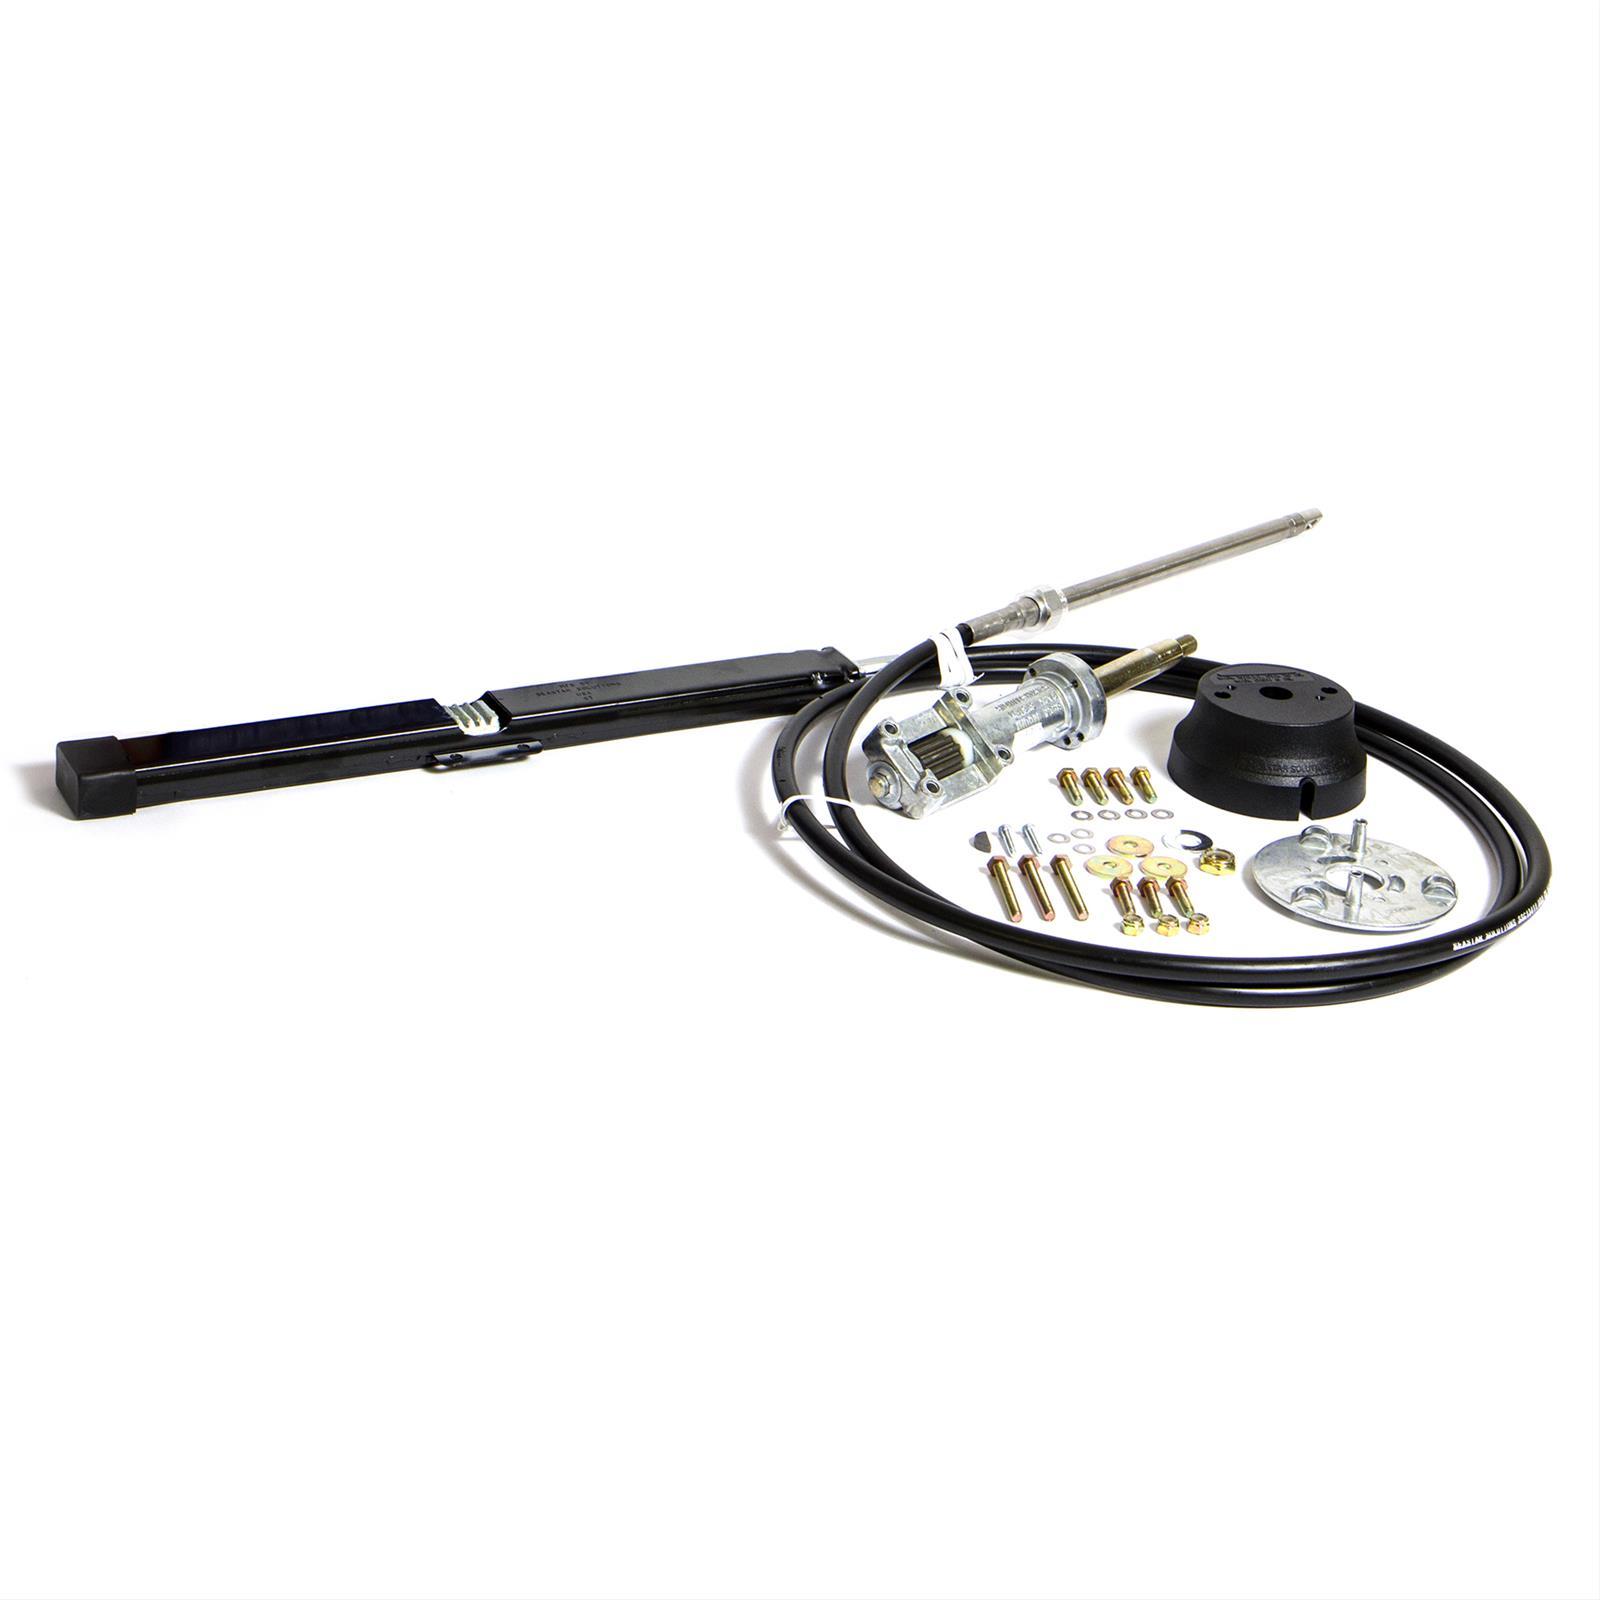 Steering Cable Marine Teleflex Rack And Pinion Helm Bezel